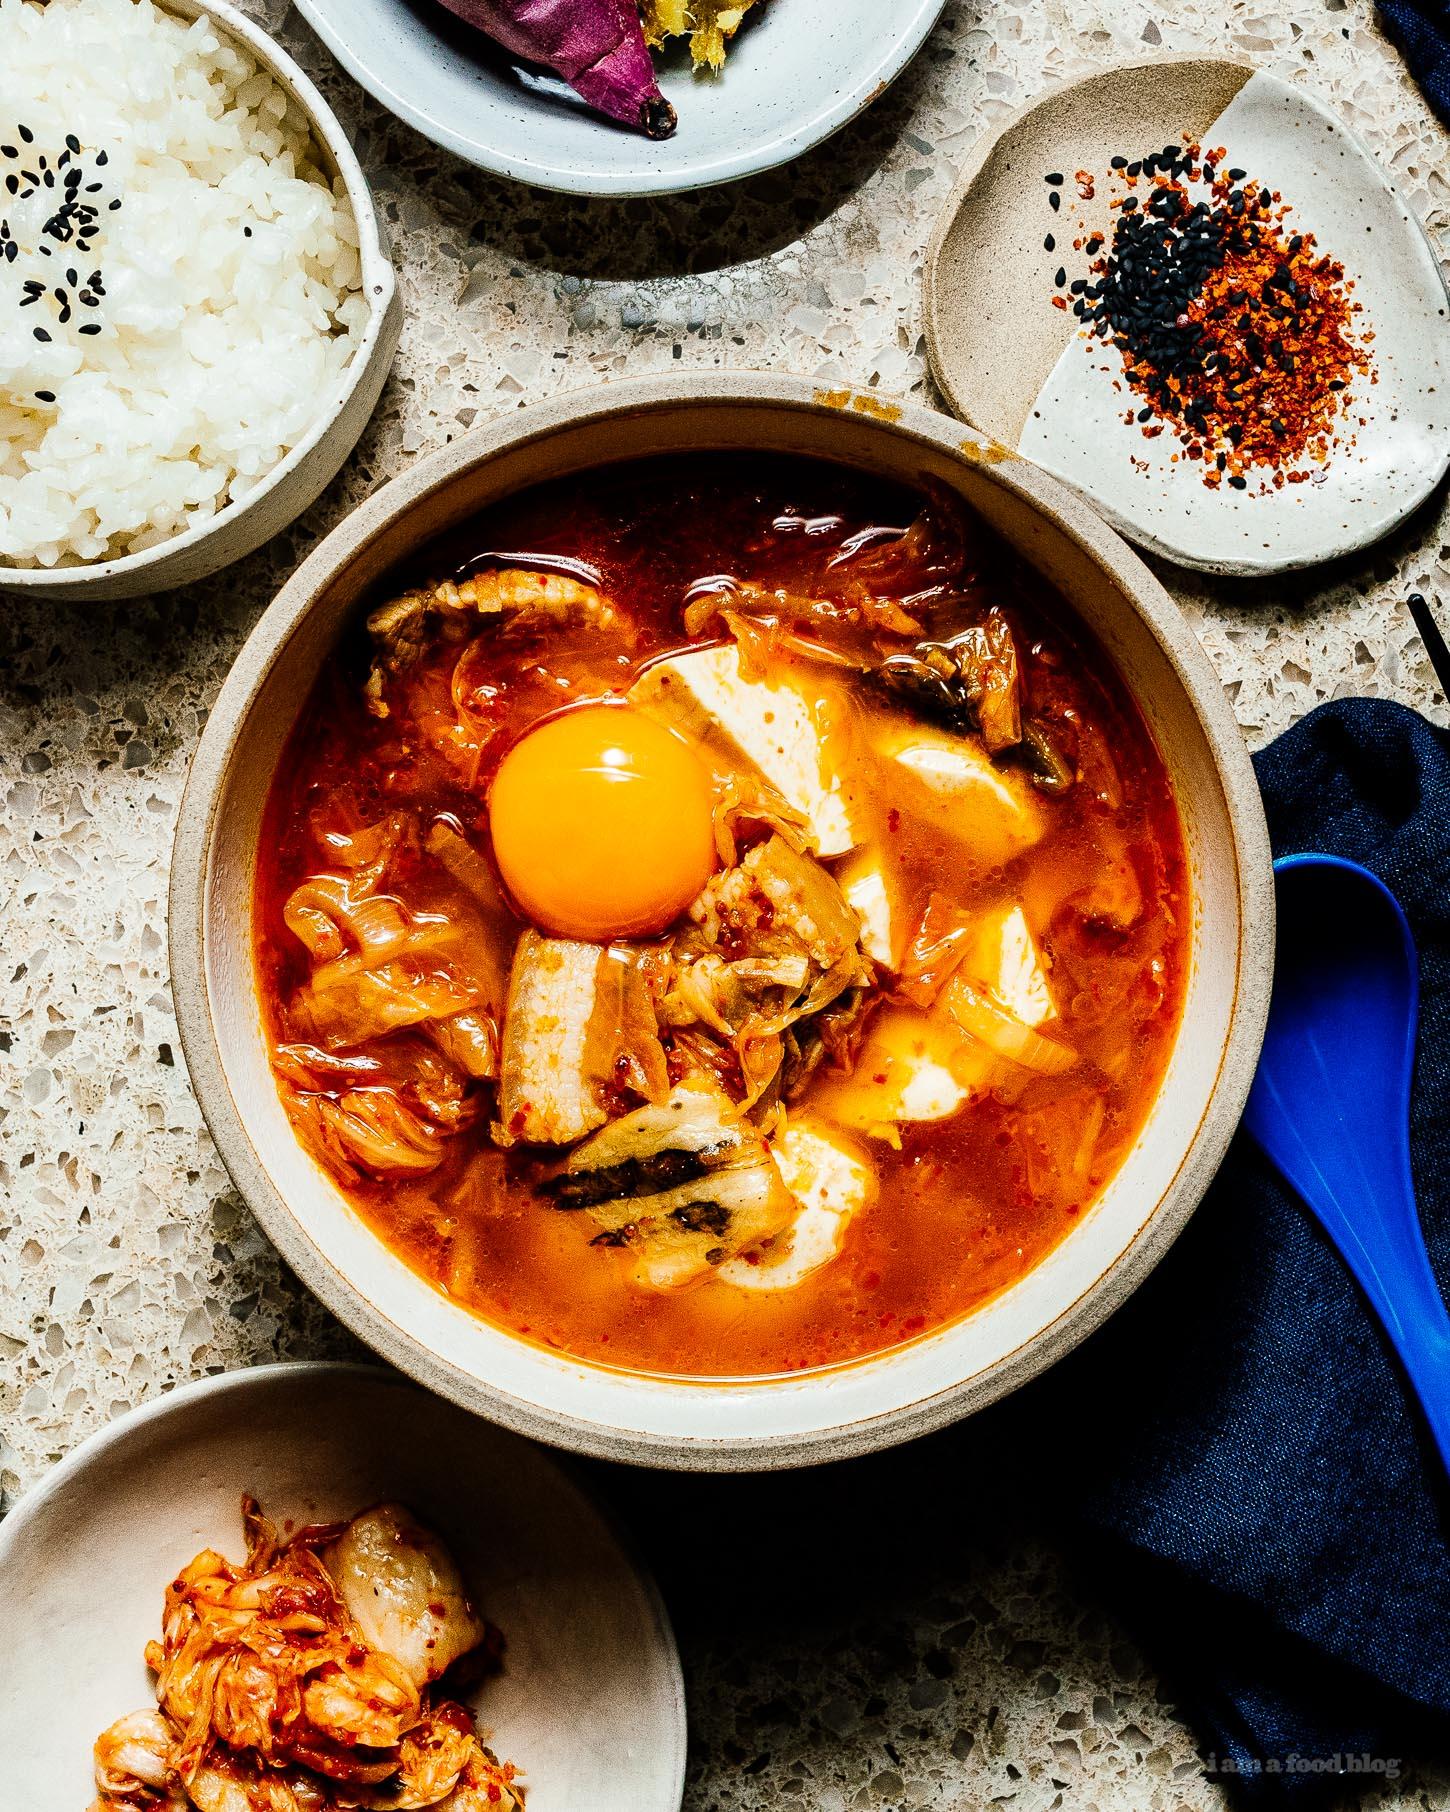 Warm and comforting sundubu jjigae/spicy kimchi soft tofu stew #kimch #tofu #korean #recipes #dinner #soup #stew #tofustew #tofusoub